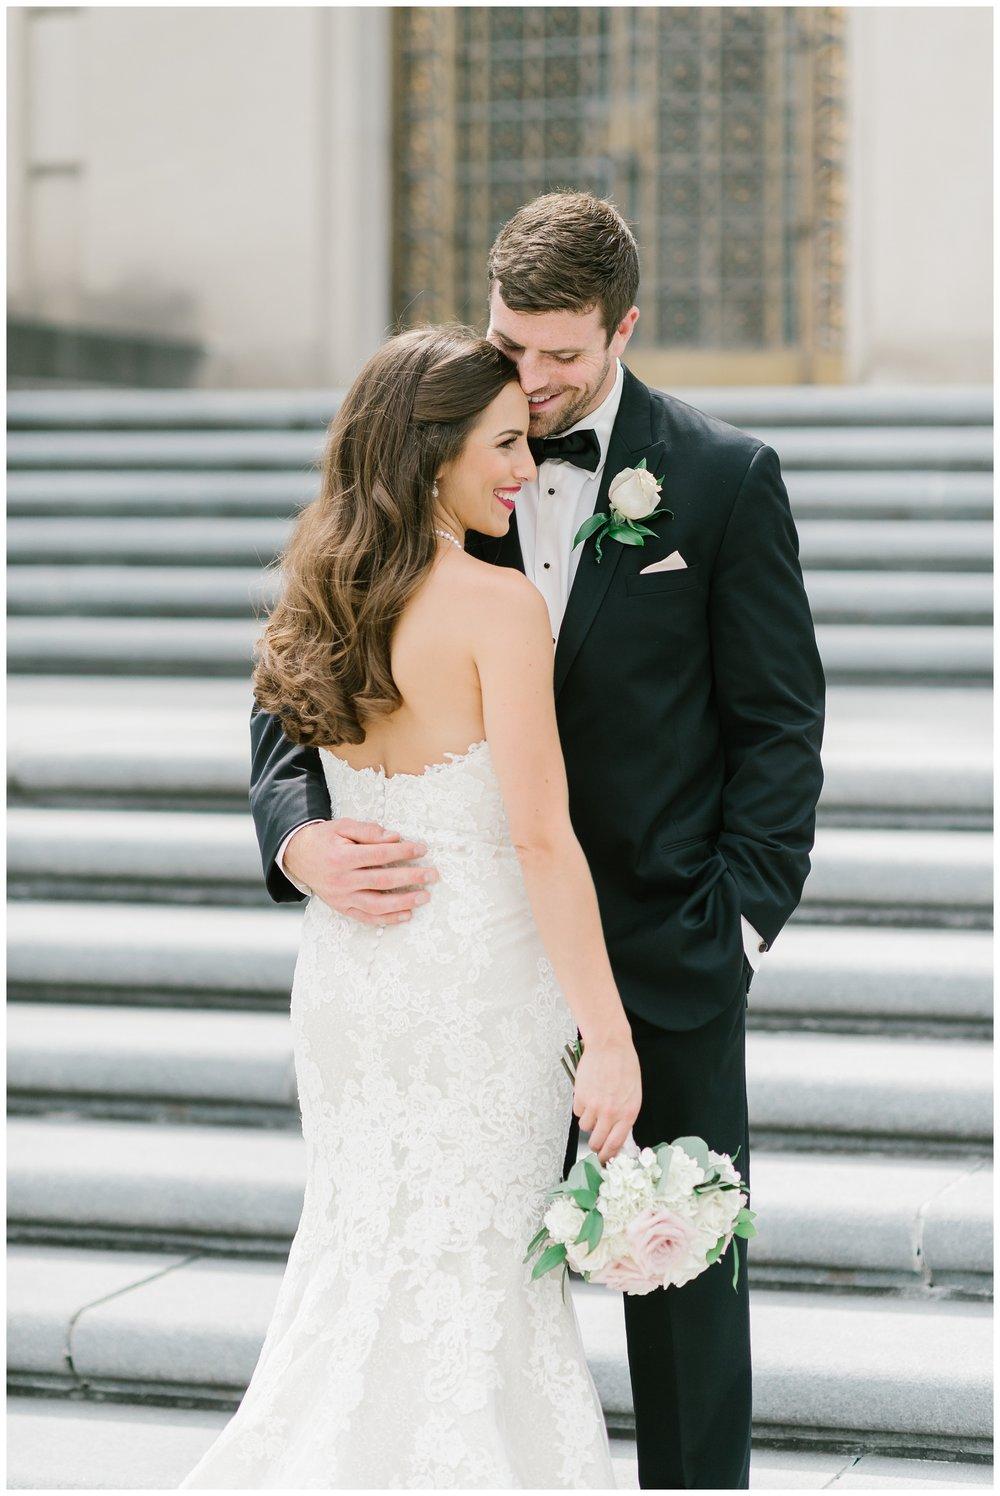 Rebecca_Bridges_Photography_Indianapolis_Wedding_Photographer_6824.jpg